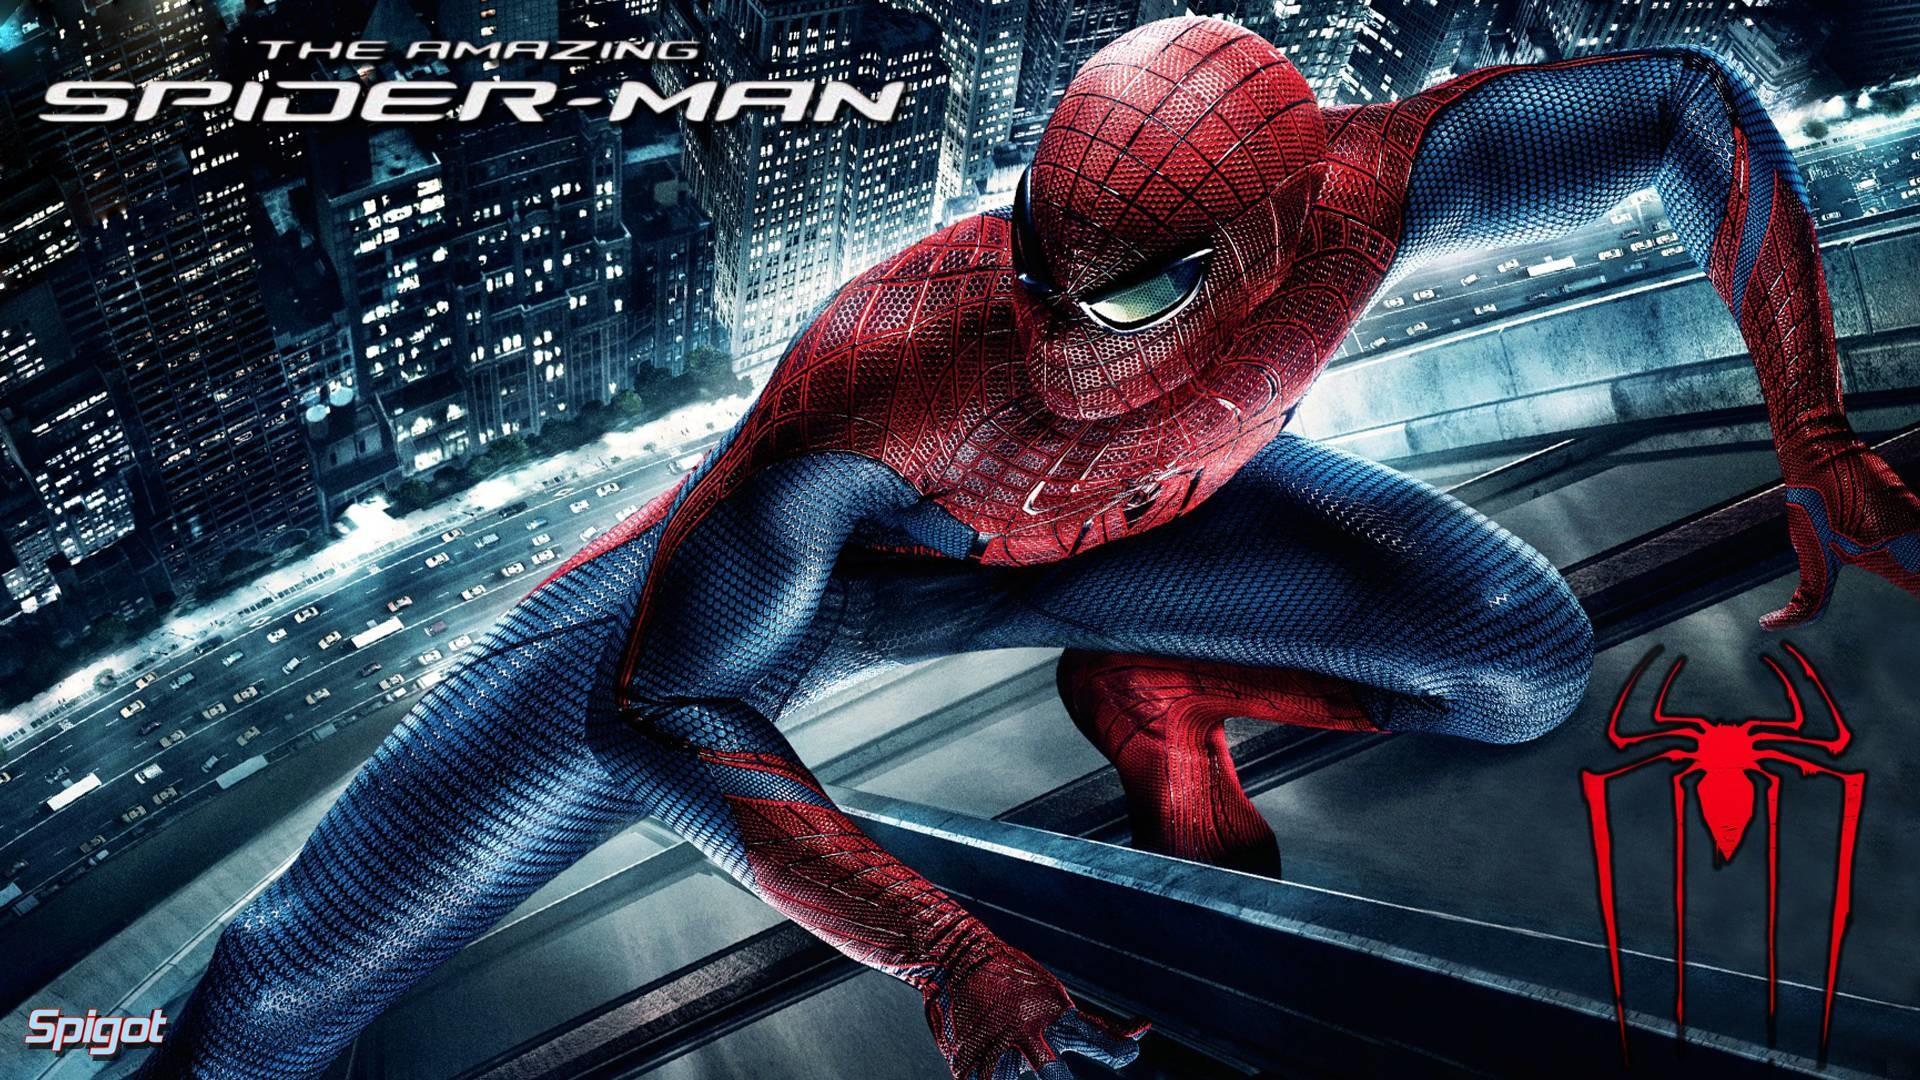 Spiderman Wallpapers HD Wallpaper | HD Wallpapers | Pinterest | Spiderman, Hd  wallpaper and Wallpaper